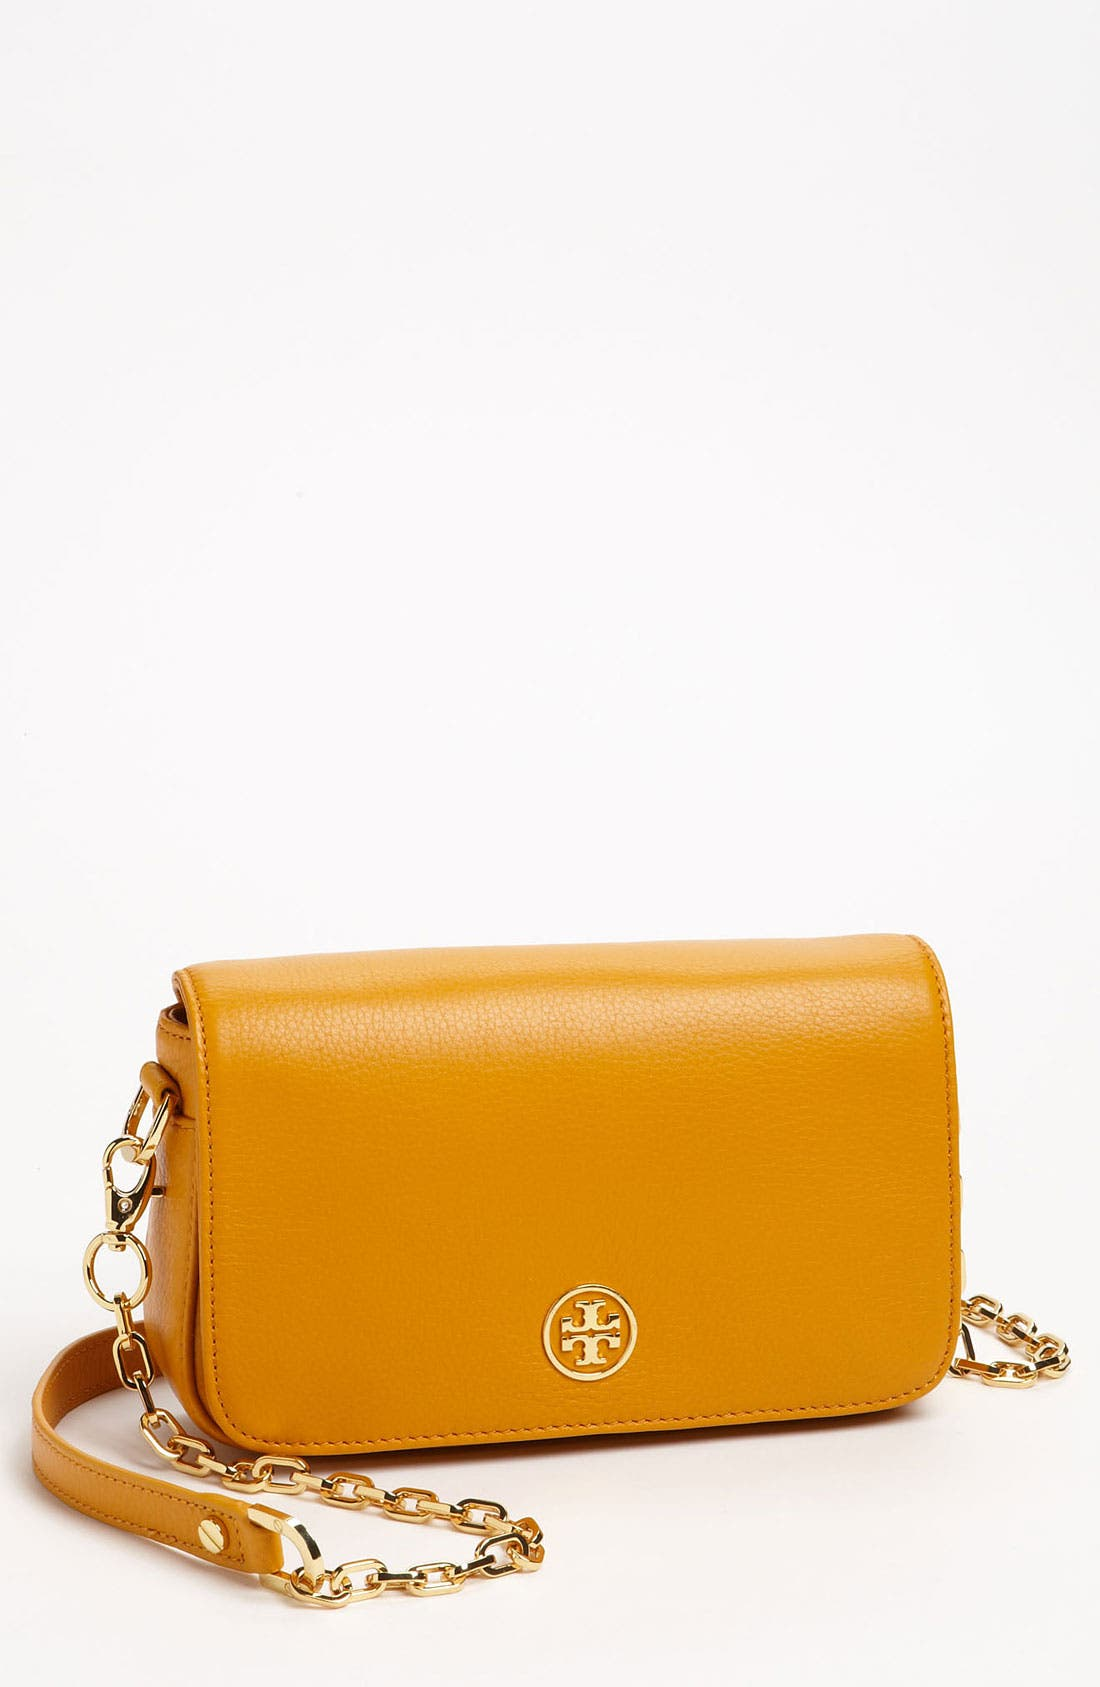 Main Image - Tory Burch 'Robinson - Mini' Adjustable Crossbody Bag